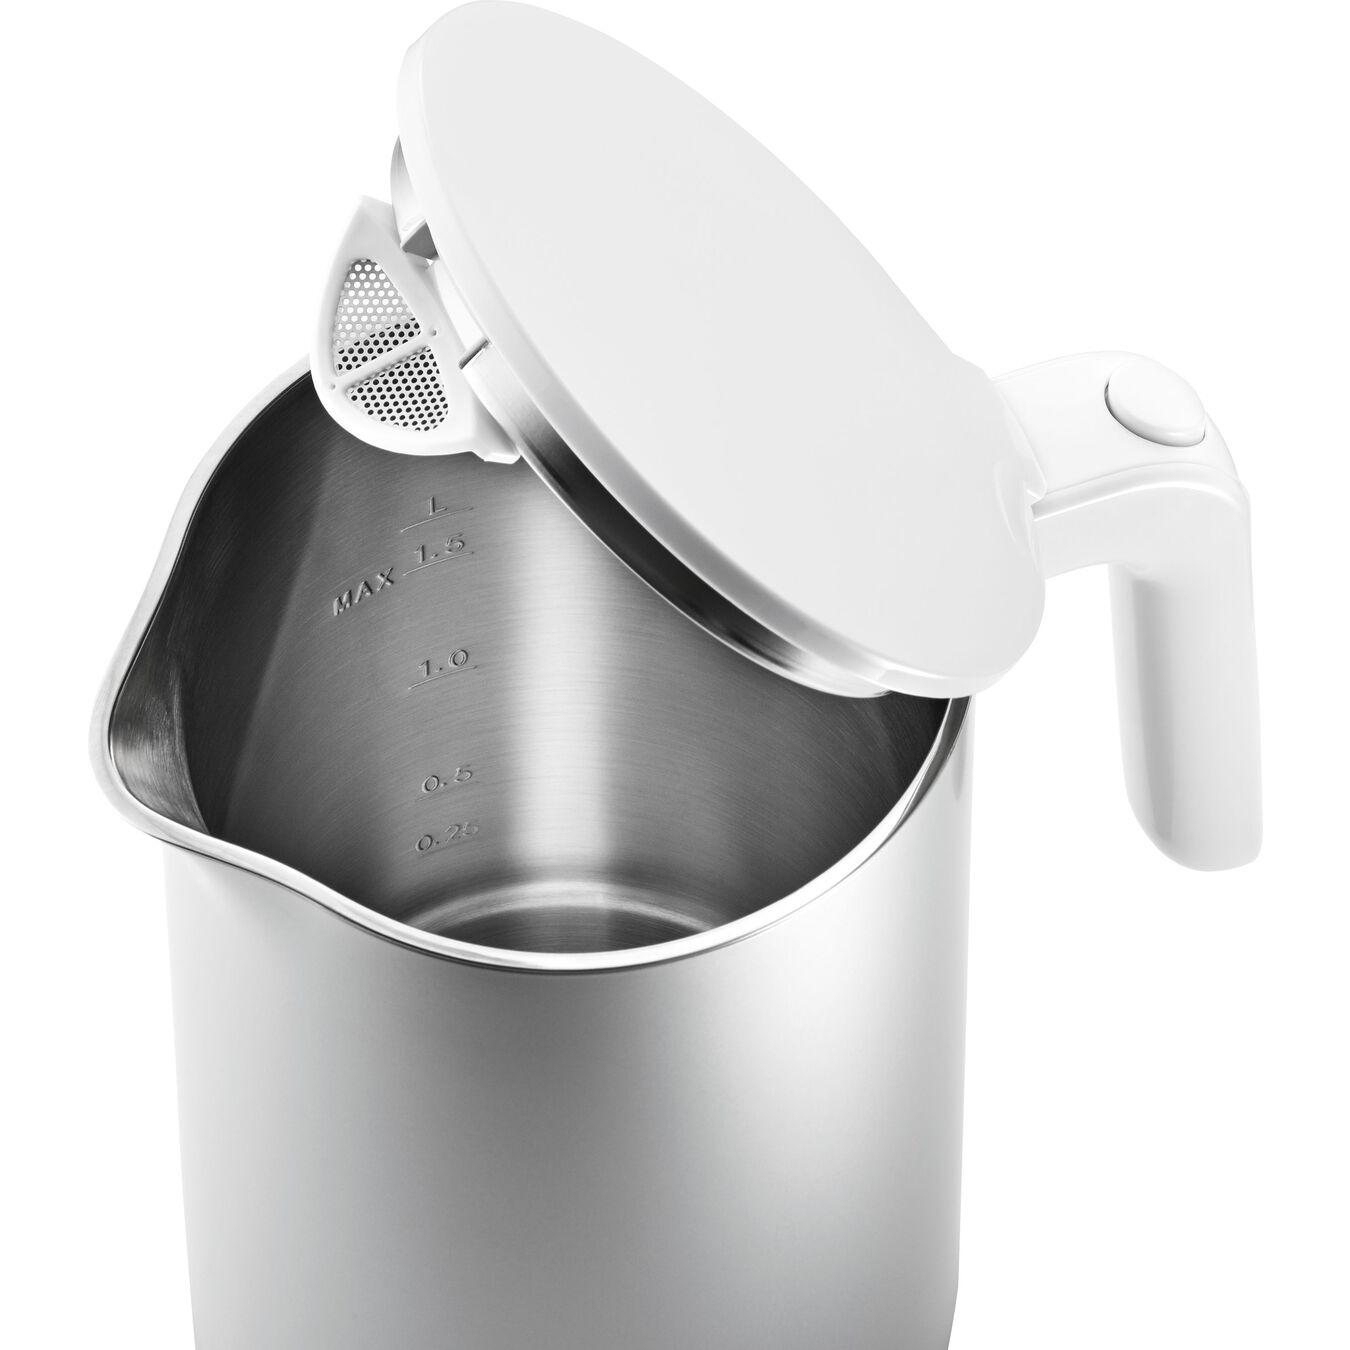 Wasserkocher Pro, 1,5 l, Silber,,large 6